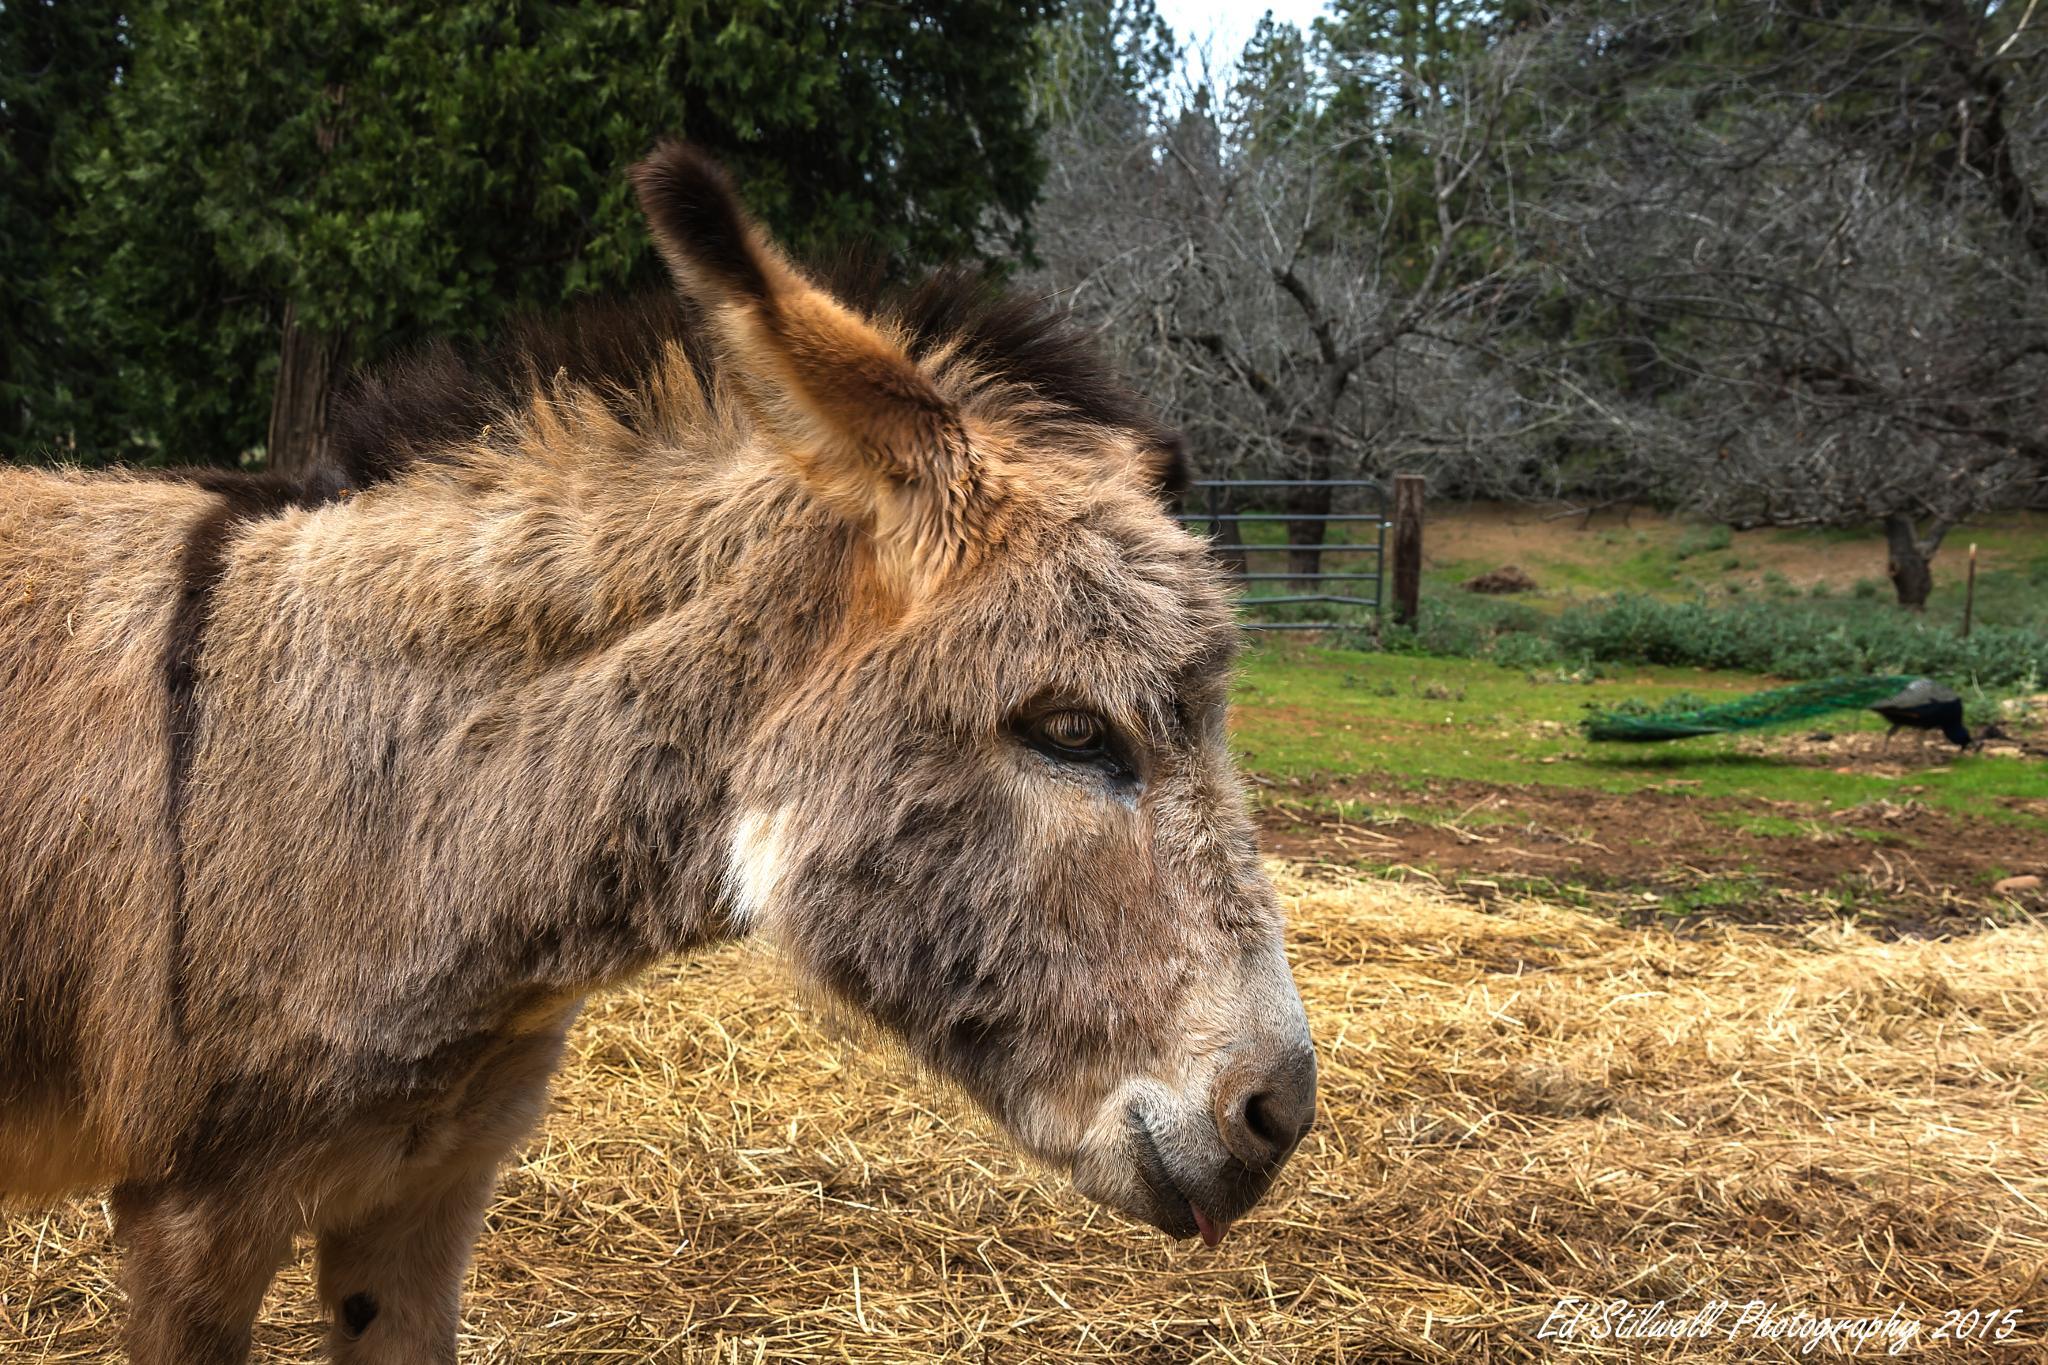 Dwarf Donkey by Ed Stilwell